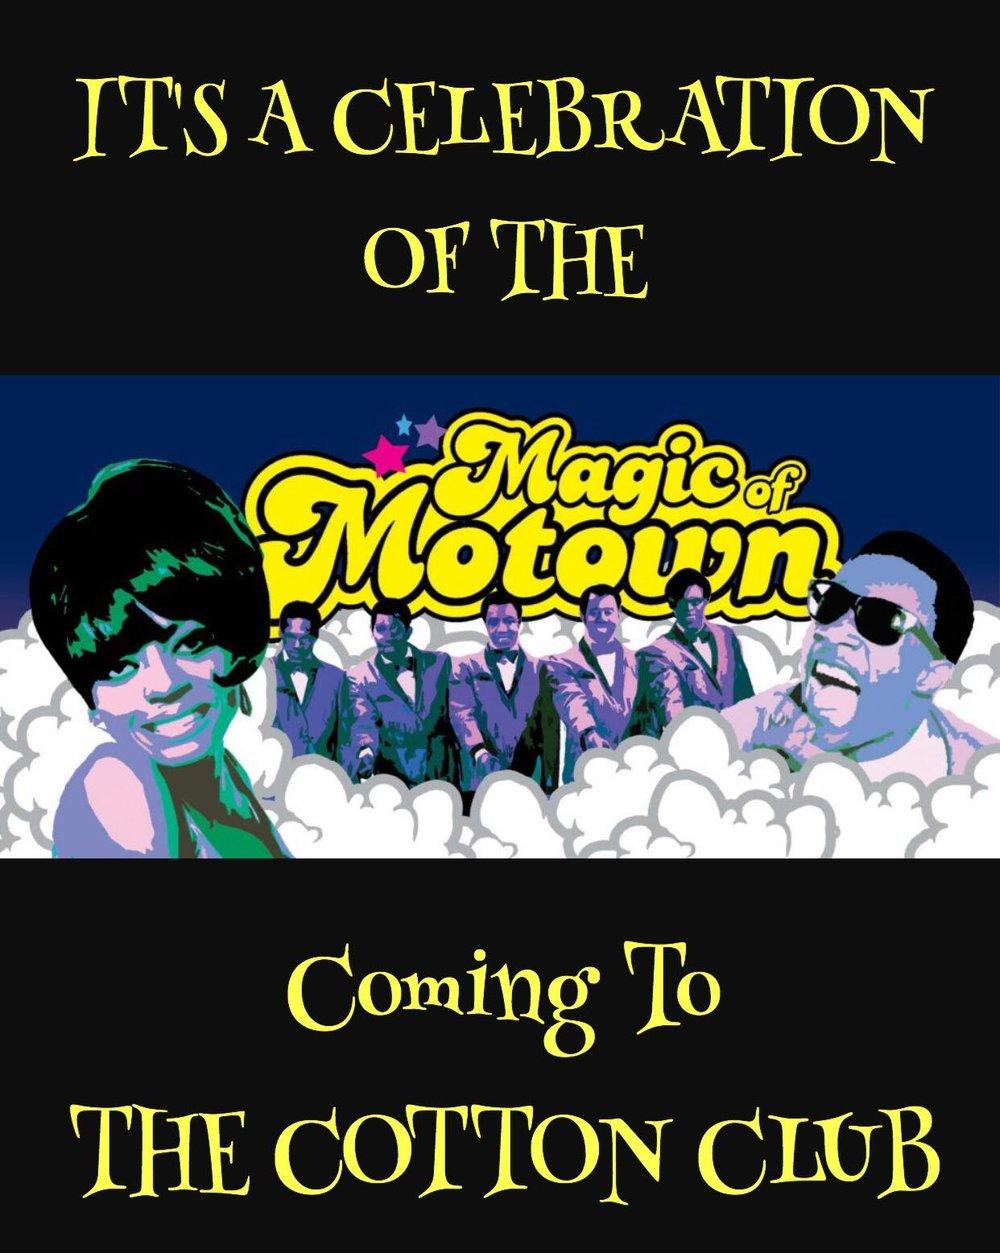 Magic of Motown is coming to Eatonton Cotton Warehouse